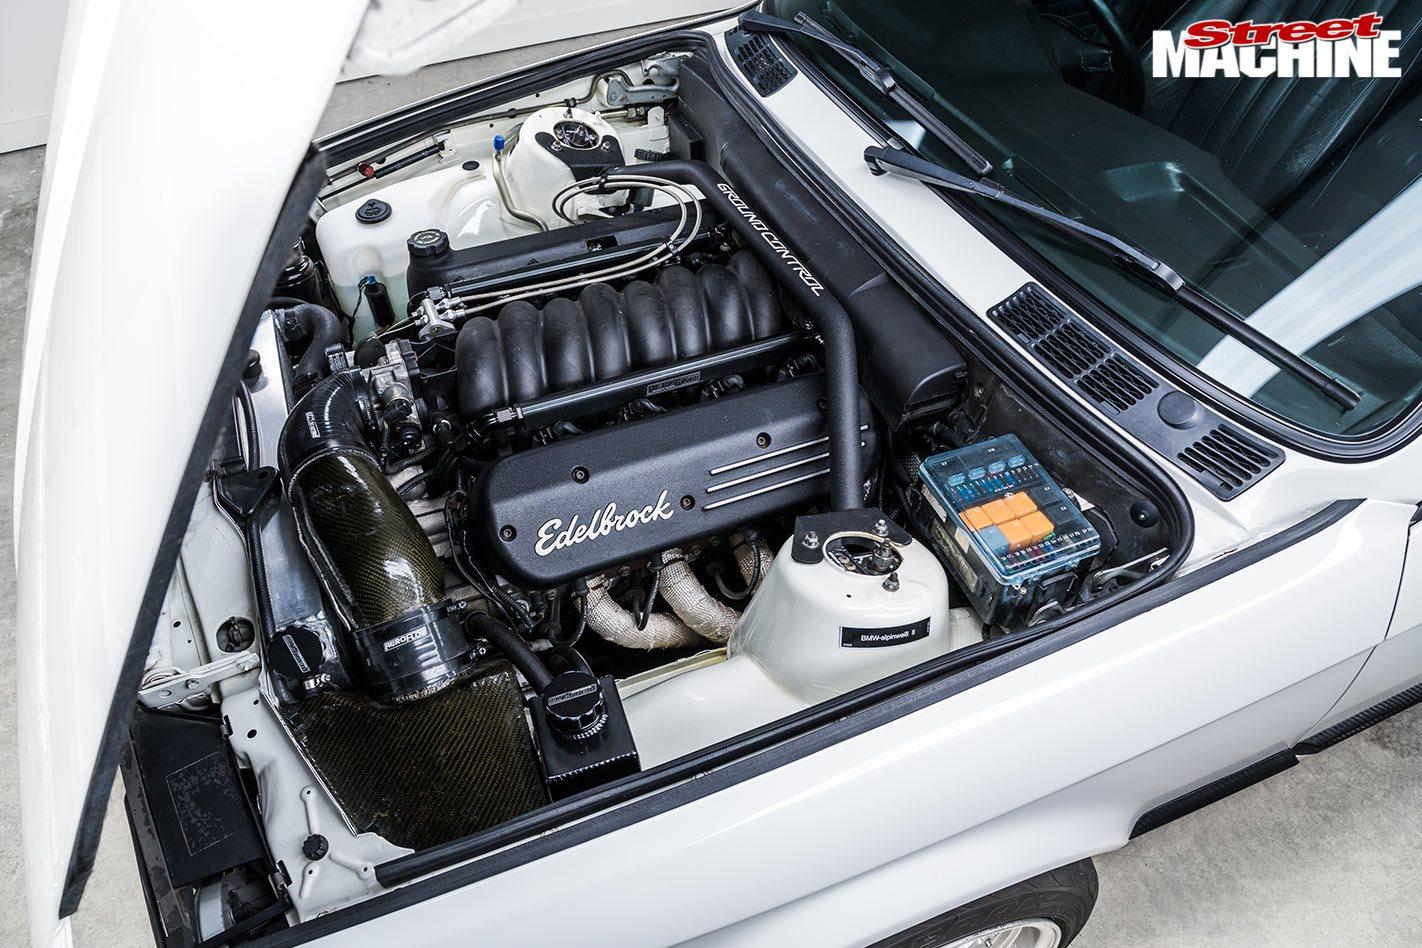 LS1-powered 1989 BMW E30